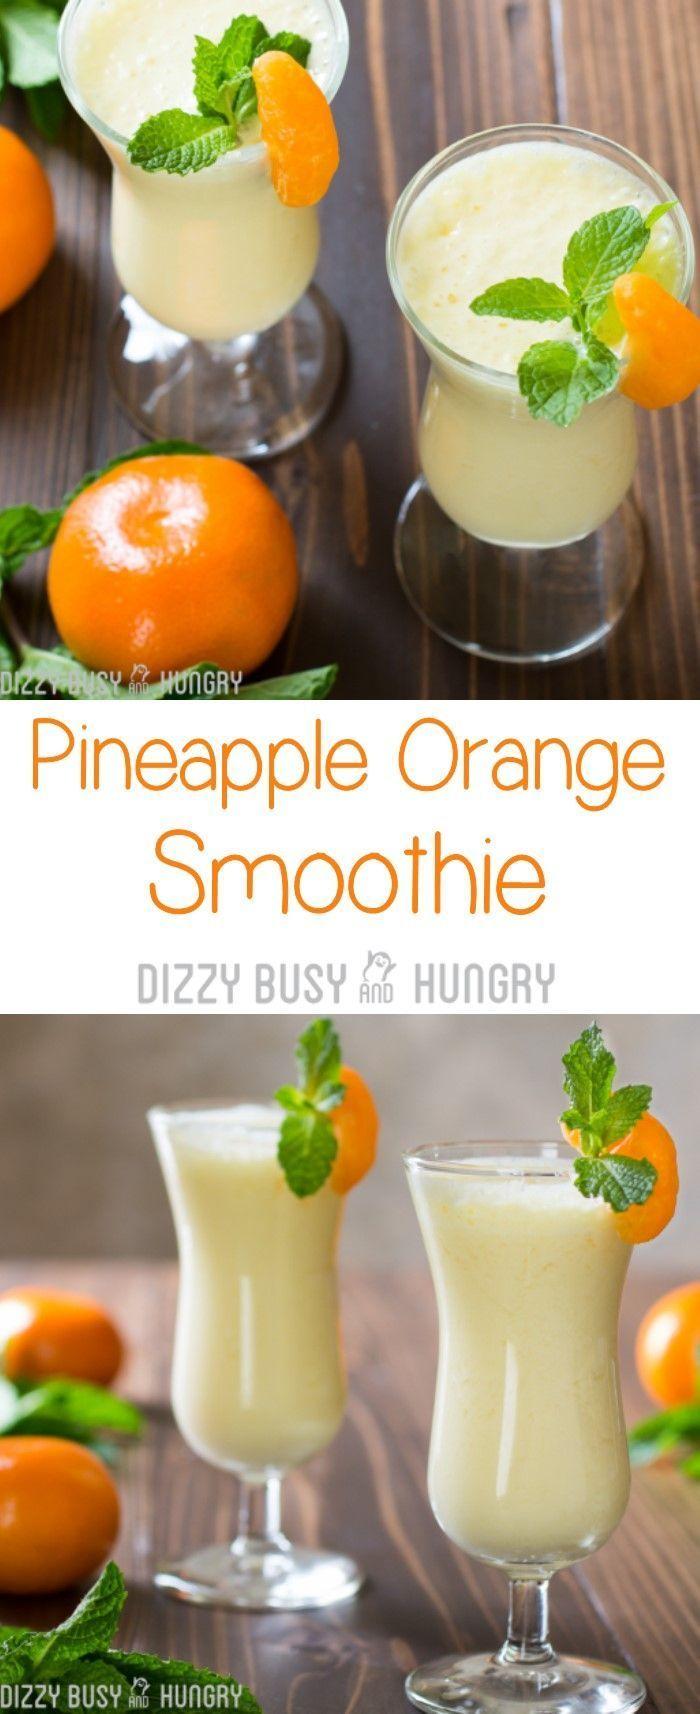 Pineapple Orange Smoothie #SundaySupper http://www.dizzybusyandhungry.com/pineapple-orange-smoothie/